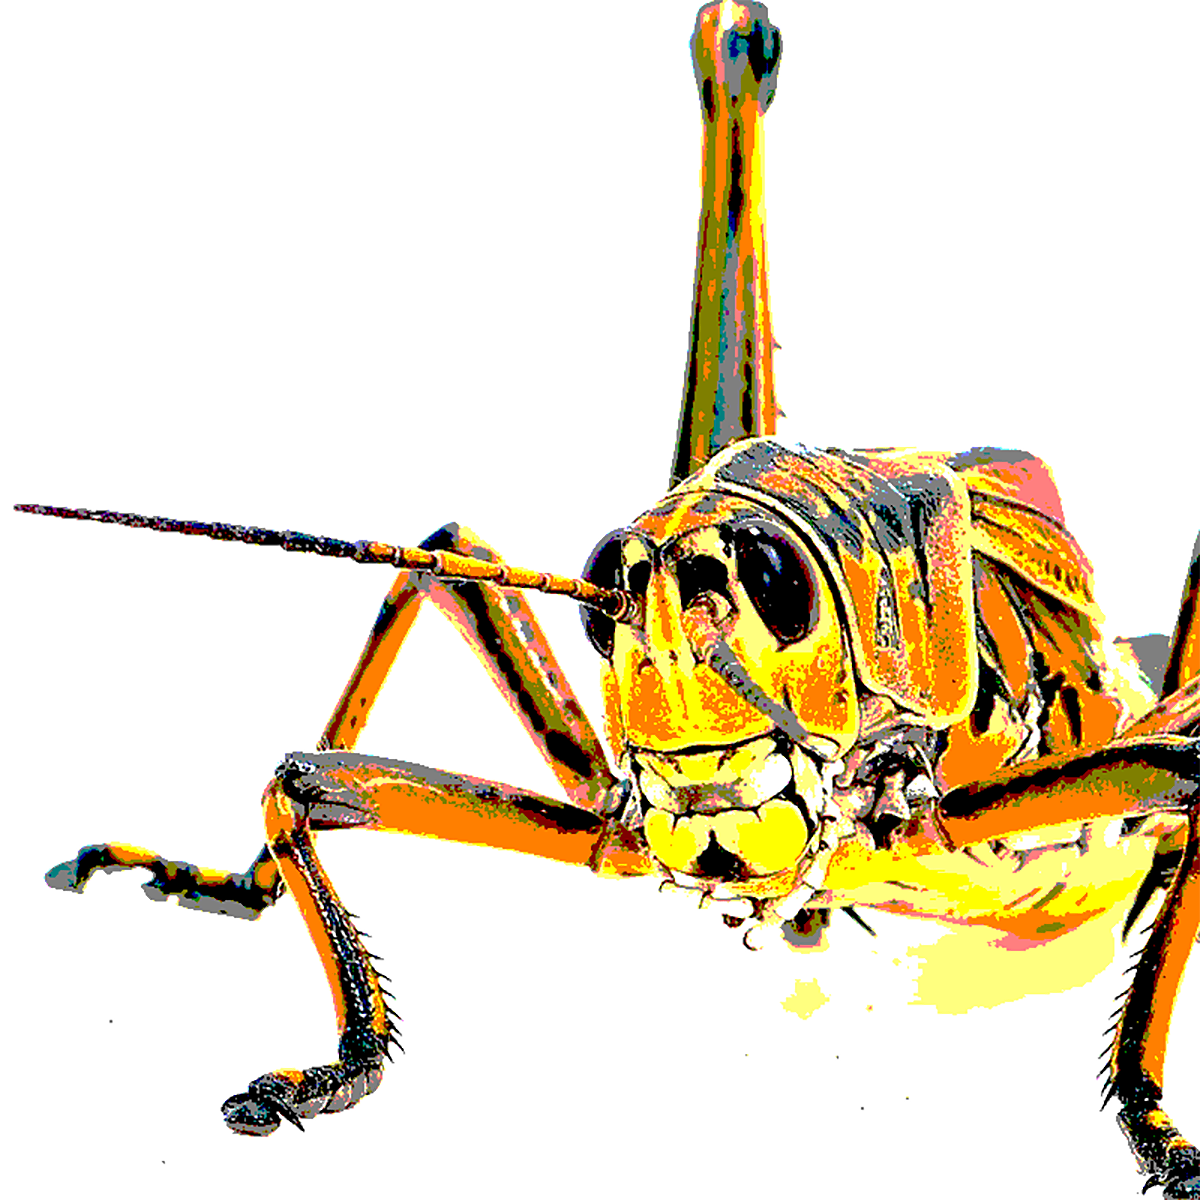 grasshopper3.png